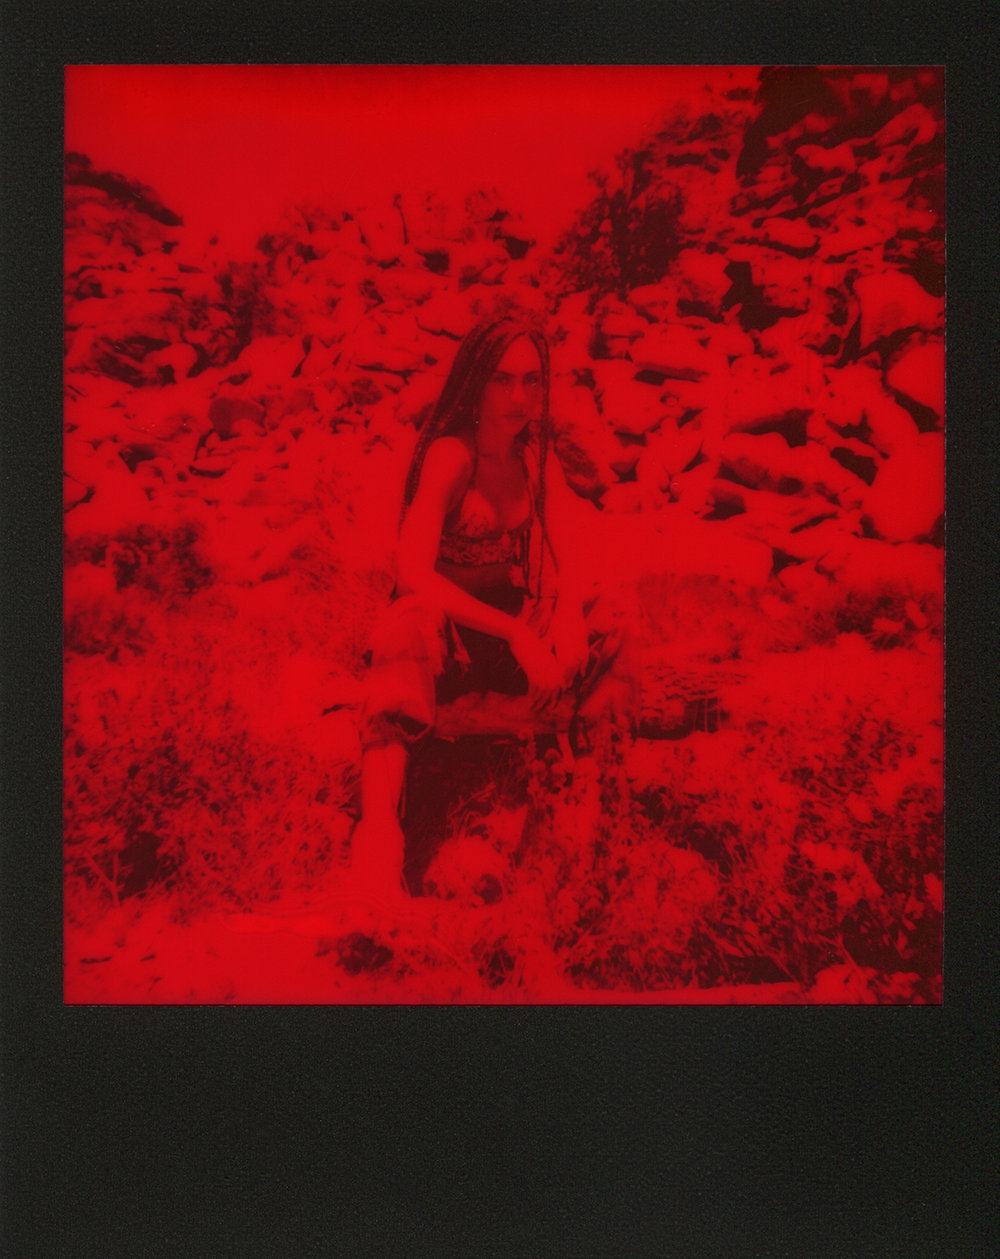 Makayla-Red-Polaroid-casenruiz.jpg